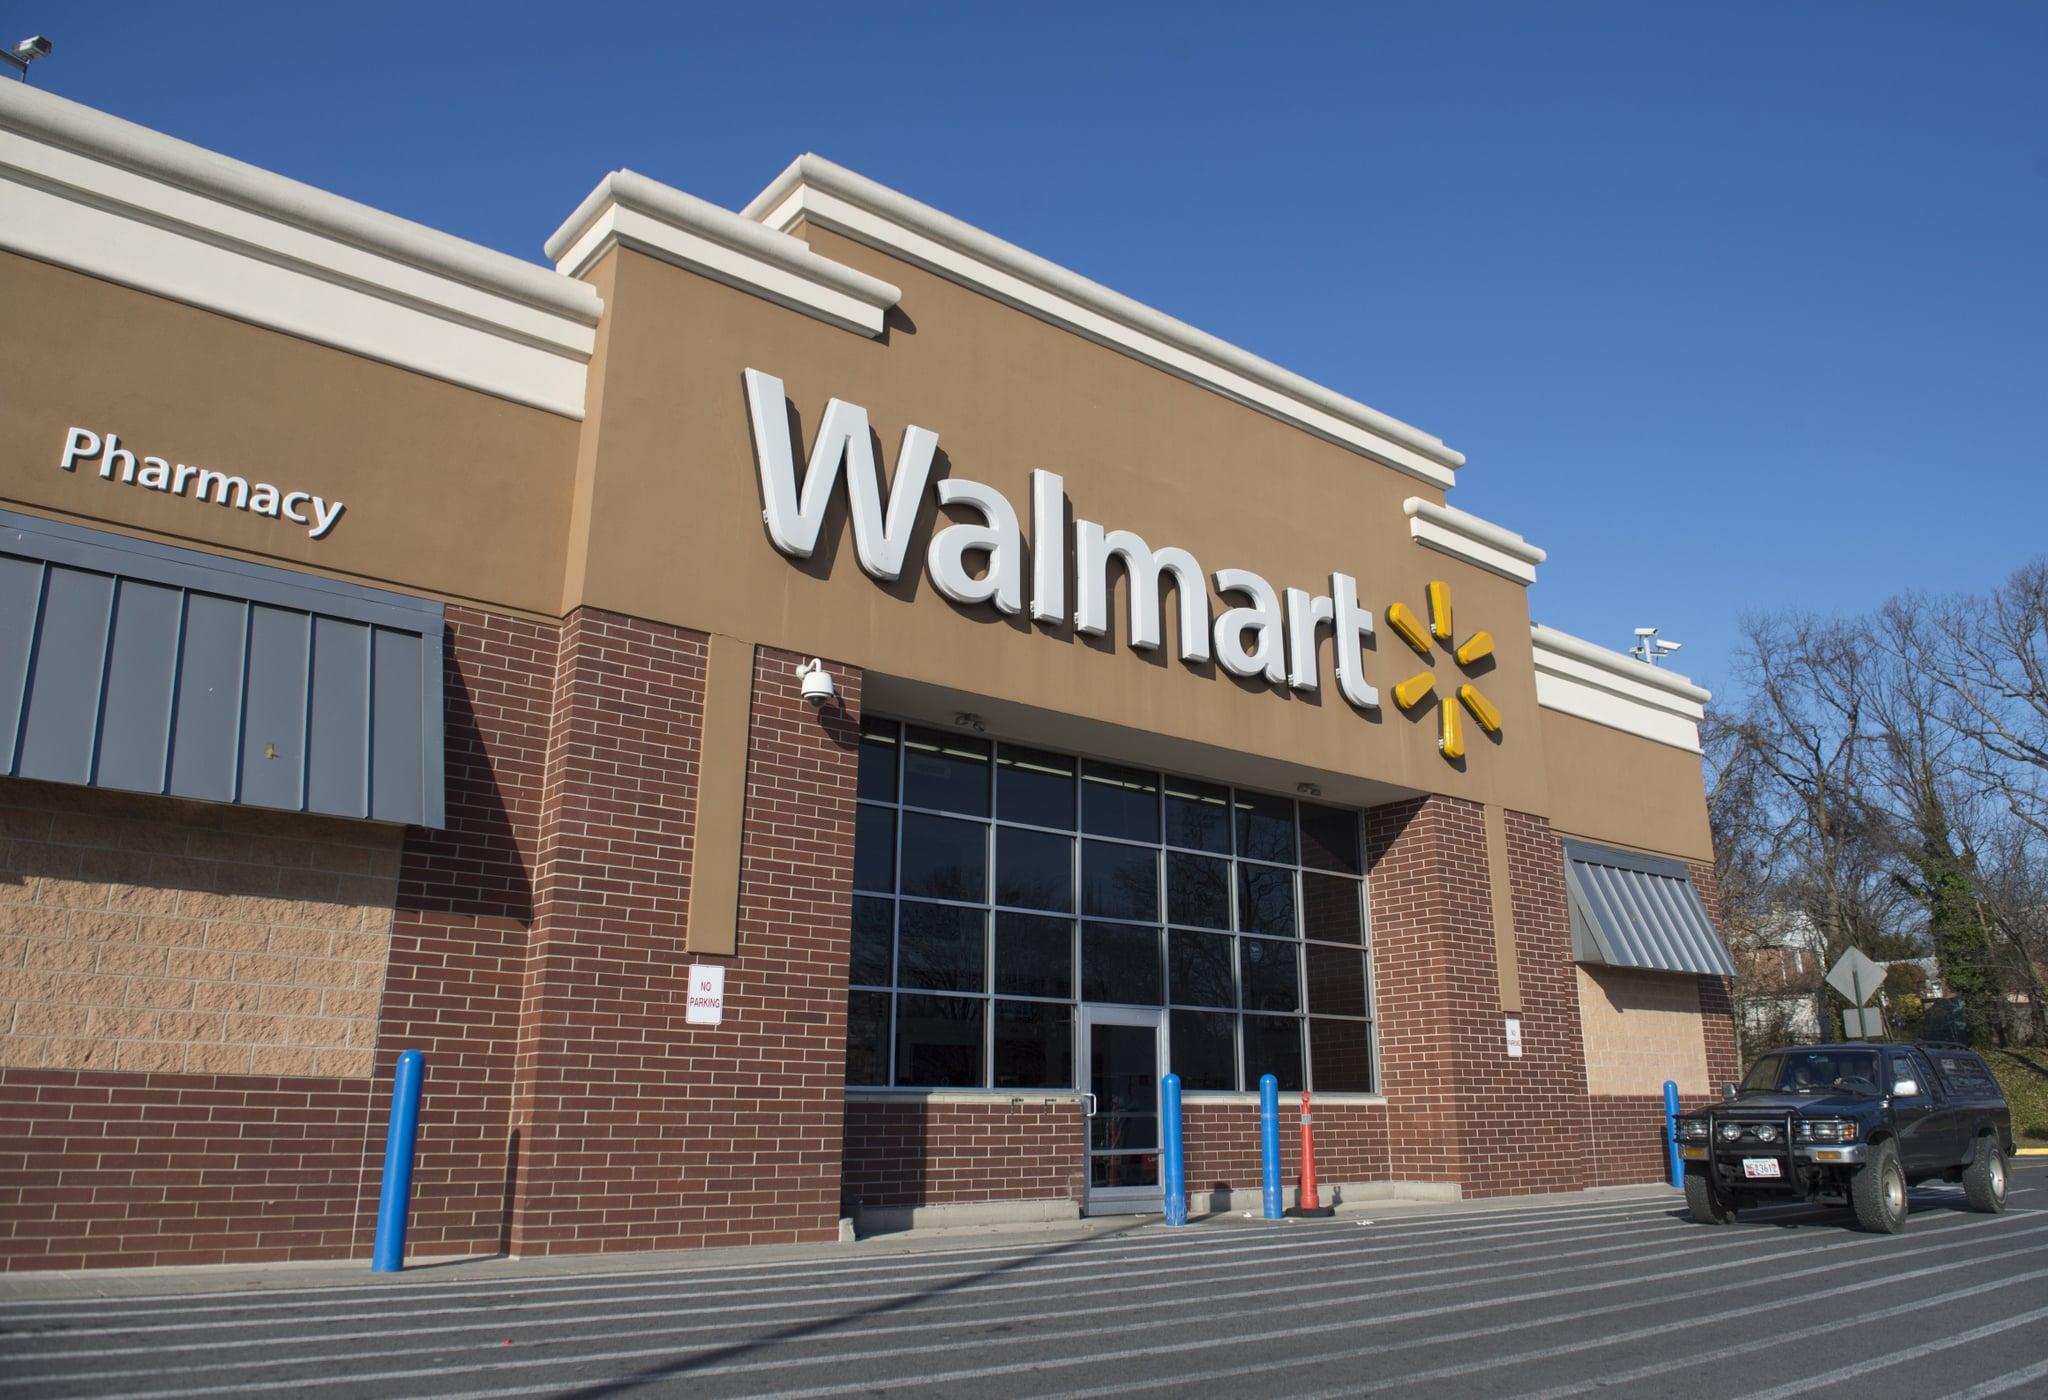 A Walmart store is seen in Landover, Maryland, December 31, 2014. AFP PHOTO / SAUL LOEB        (Photo credit should read SAUL LOEB/AFP via Getty Images)